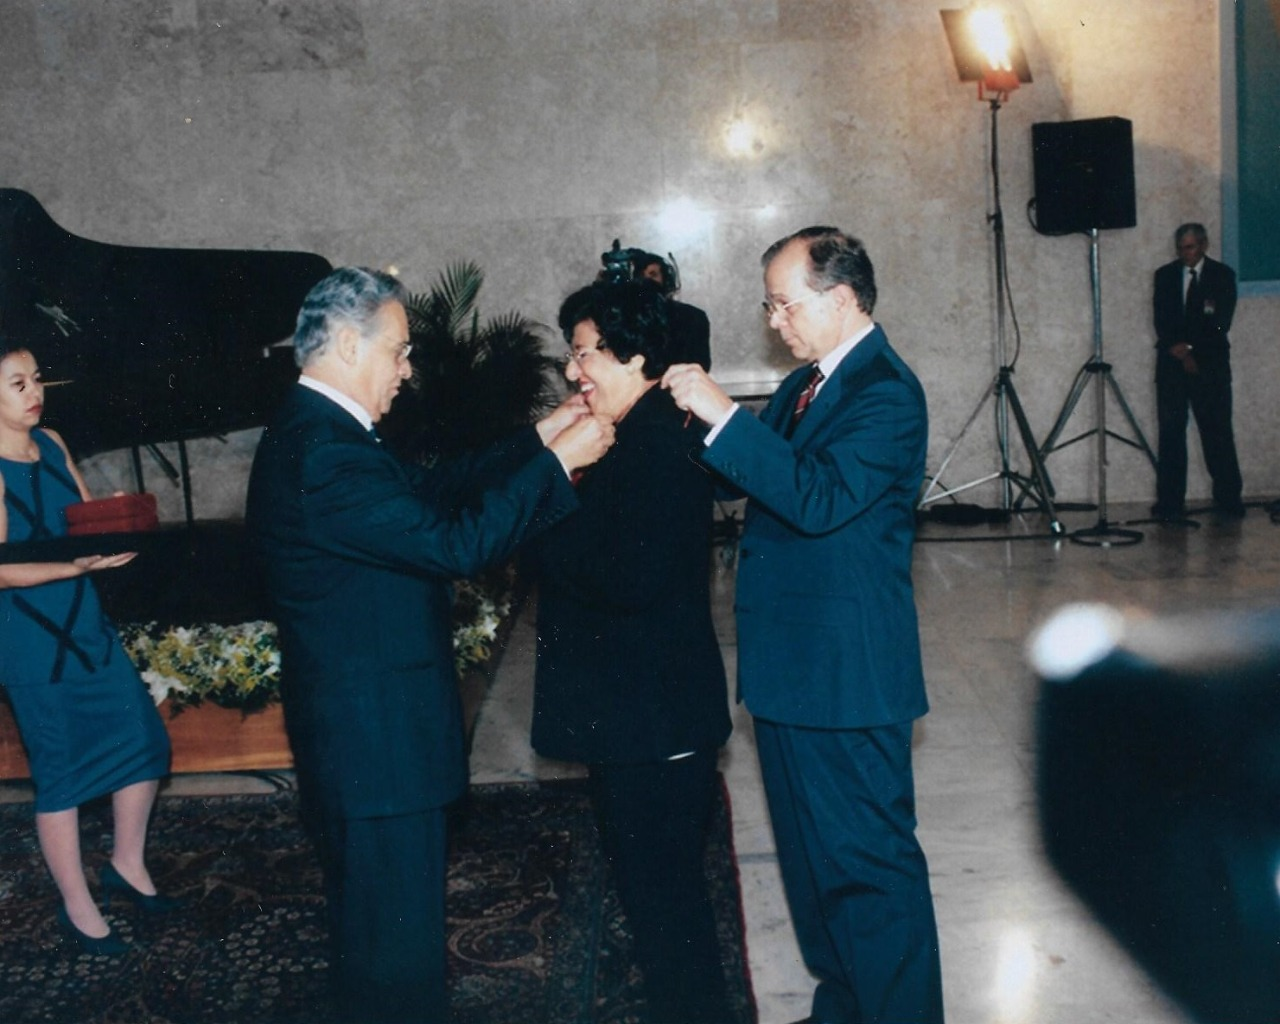 Ruth Rocha recebe medalha do ex-presidente Fernando Henrique Cardoso